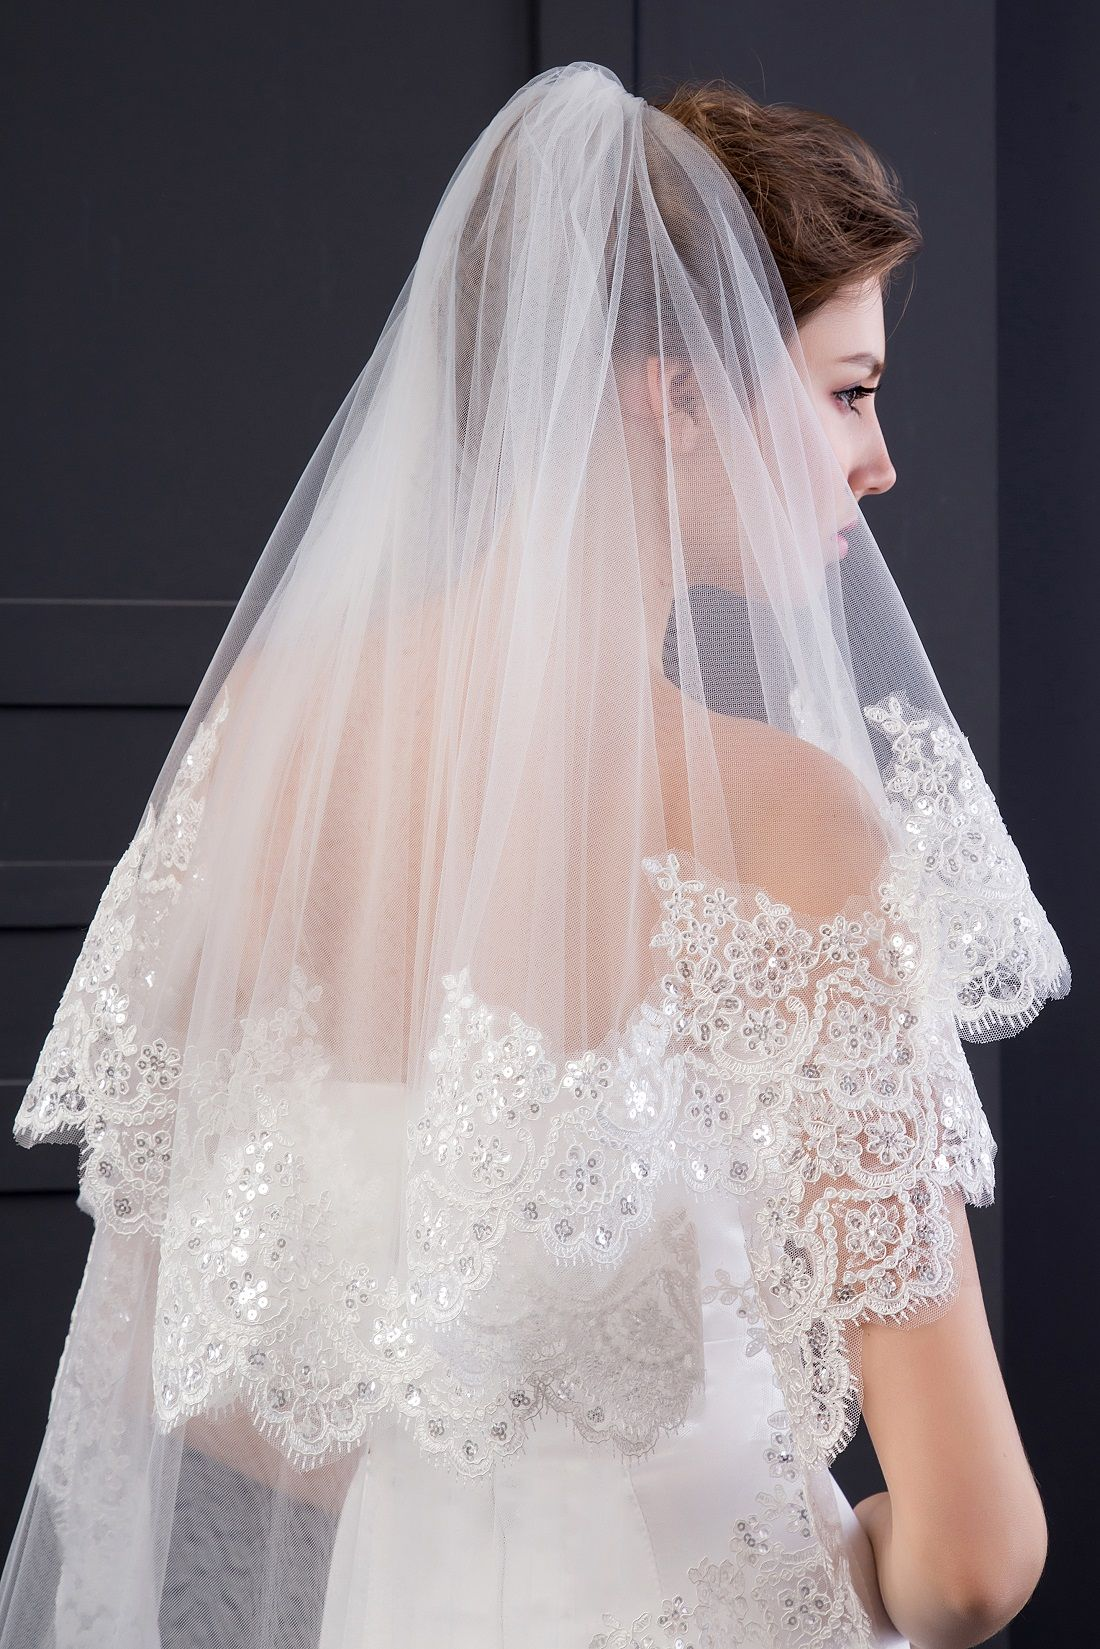 EllieHouse Women's Custom Made Long 2 Tier Wedding Bridal